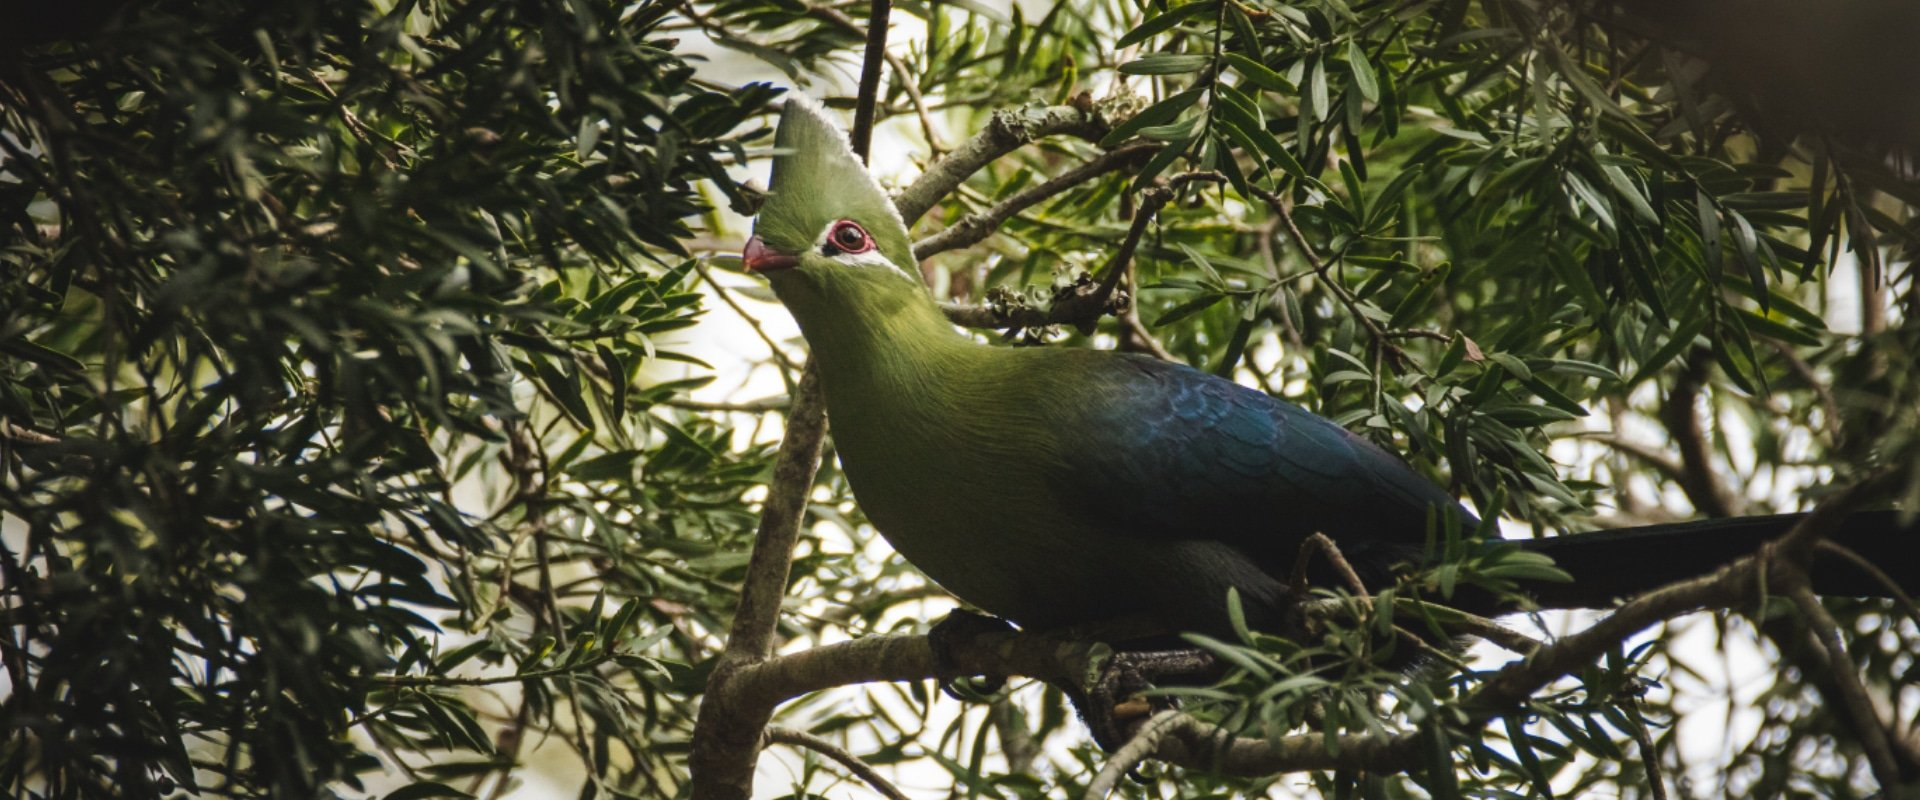 Admire indigenous forest birds